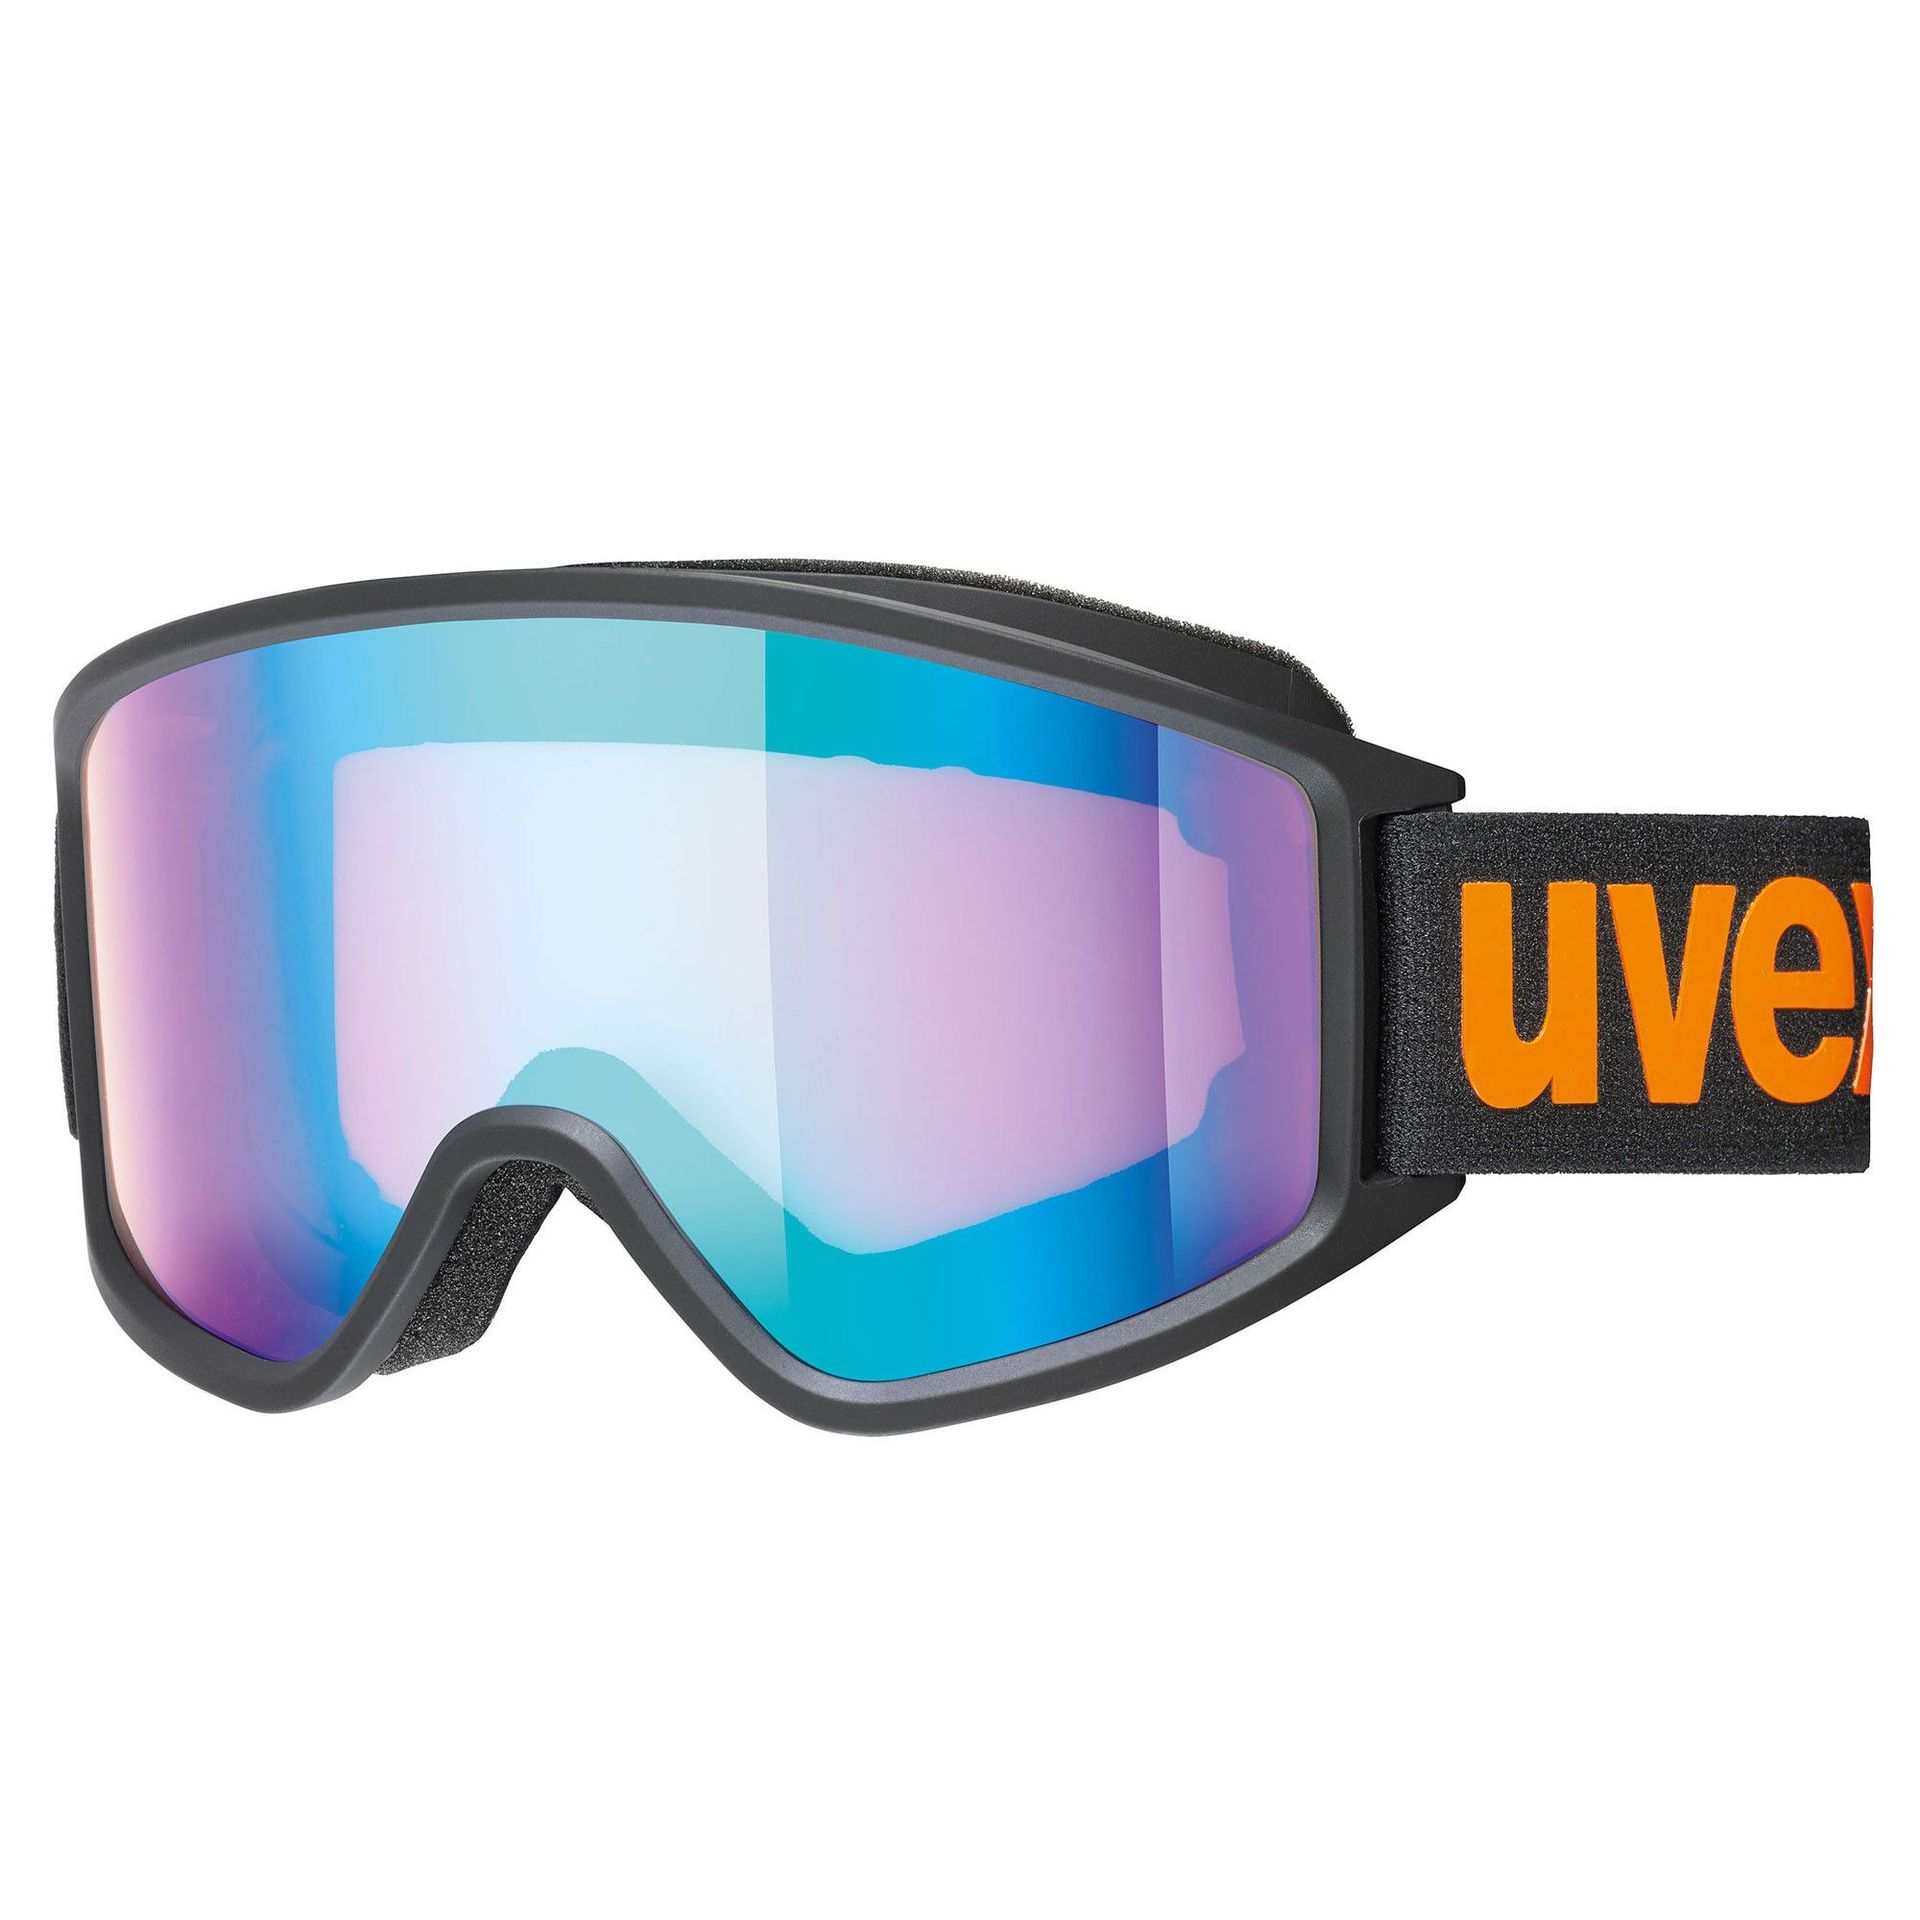 GOGLE UVEX G.GL 3000 CV BLACK ORANGE MAT MIRROR BLUE COLORVISION ORANGE 55 1 333 2130